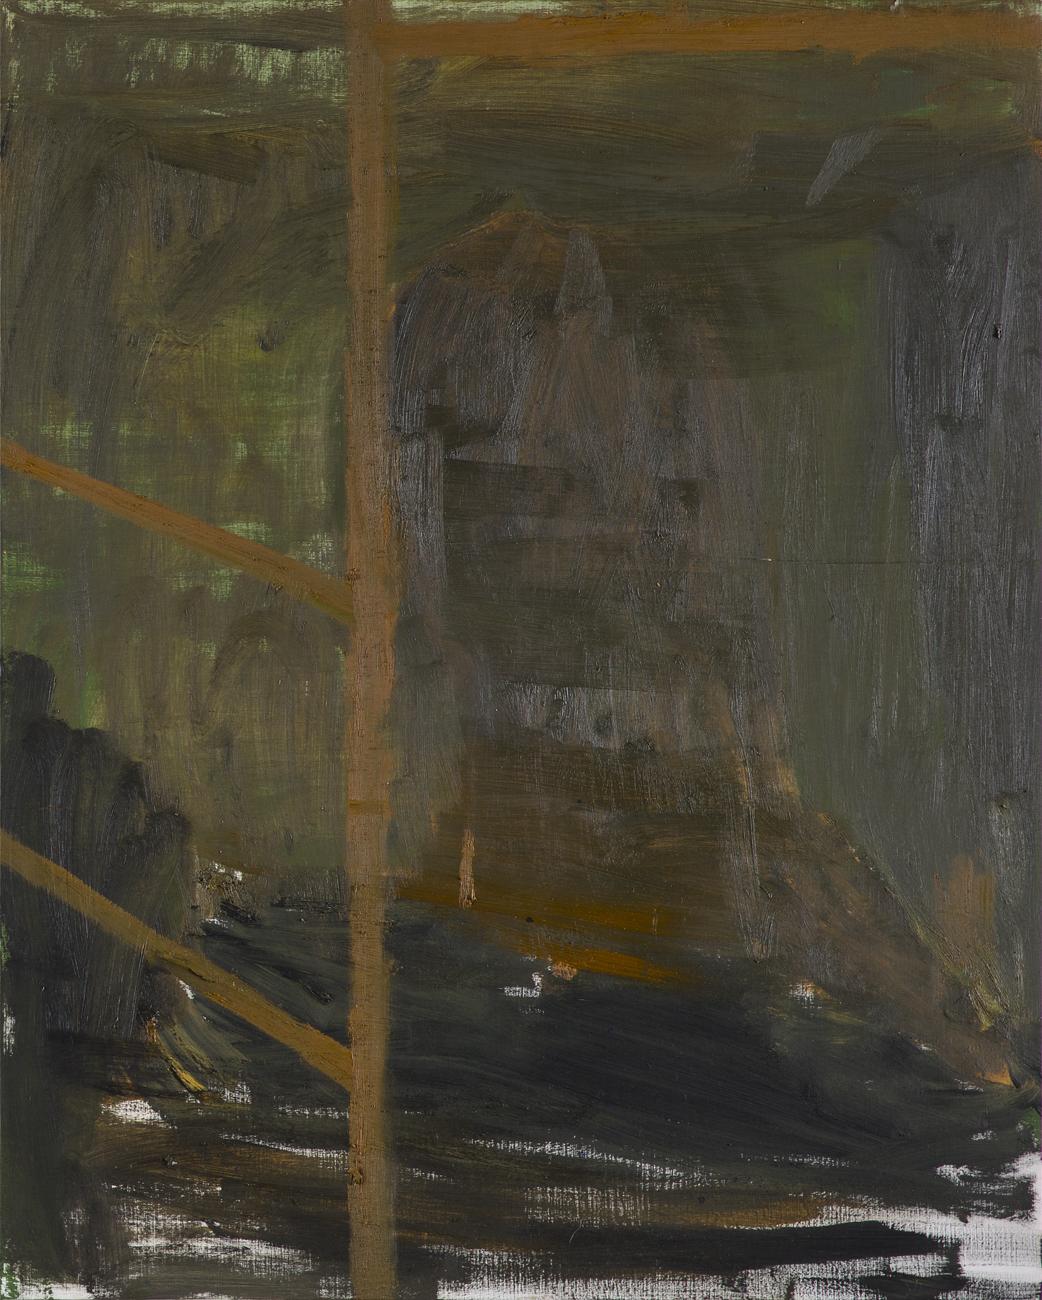 Andreas Eriksson  Skugga 2  2010 Oil on panel 75 x 60 cm